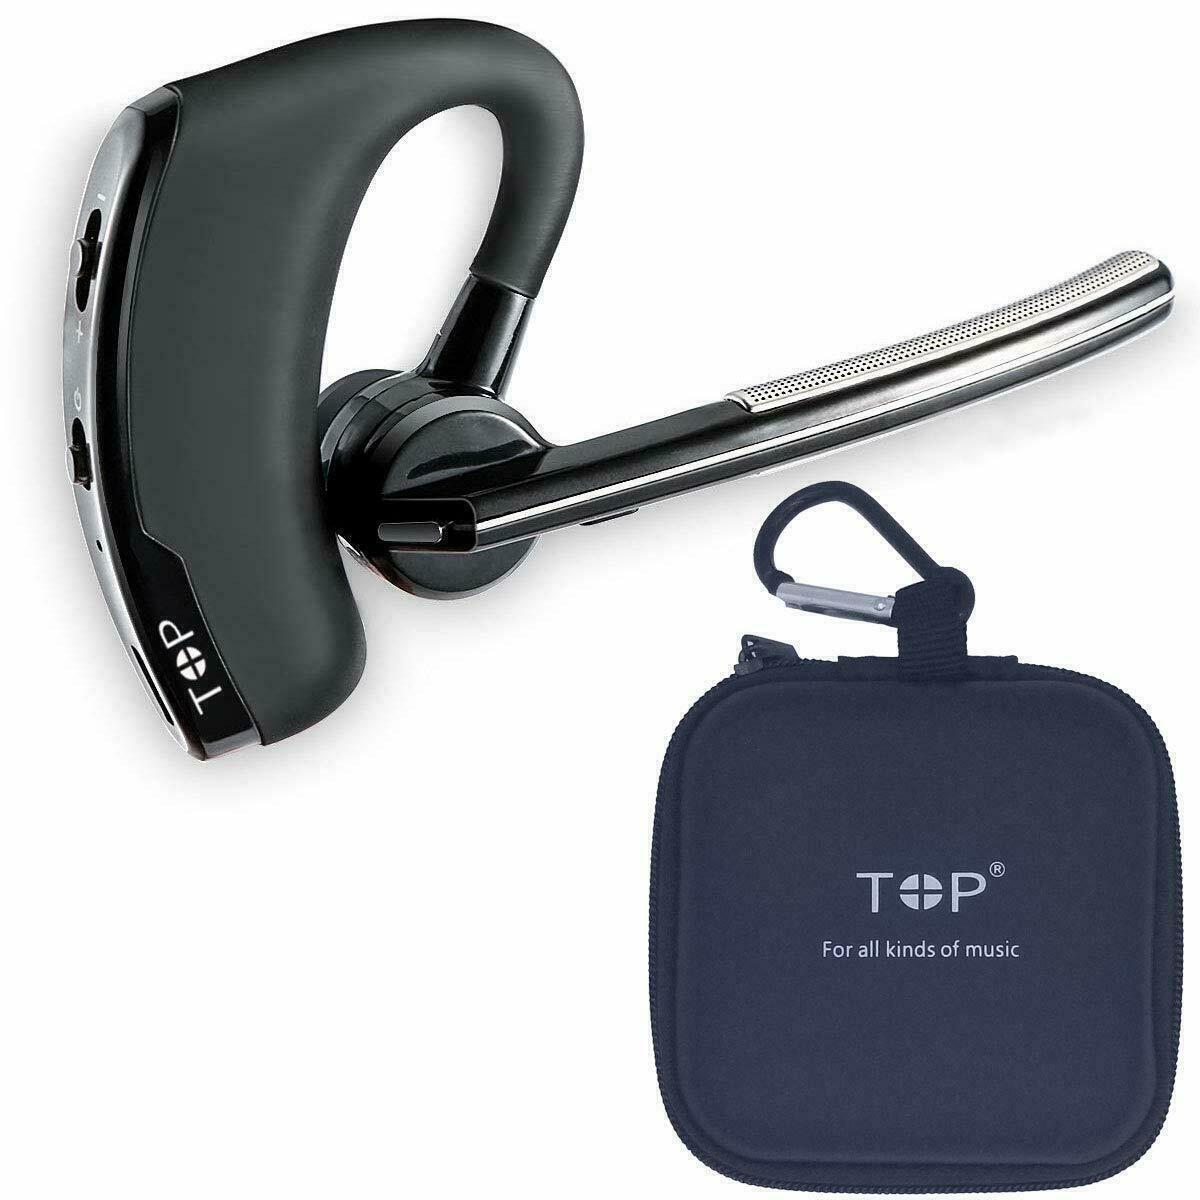 Wireless Earpiece Bluetooth Handsfree Noise Cancelling Stere